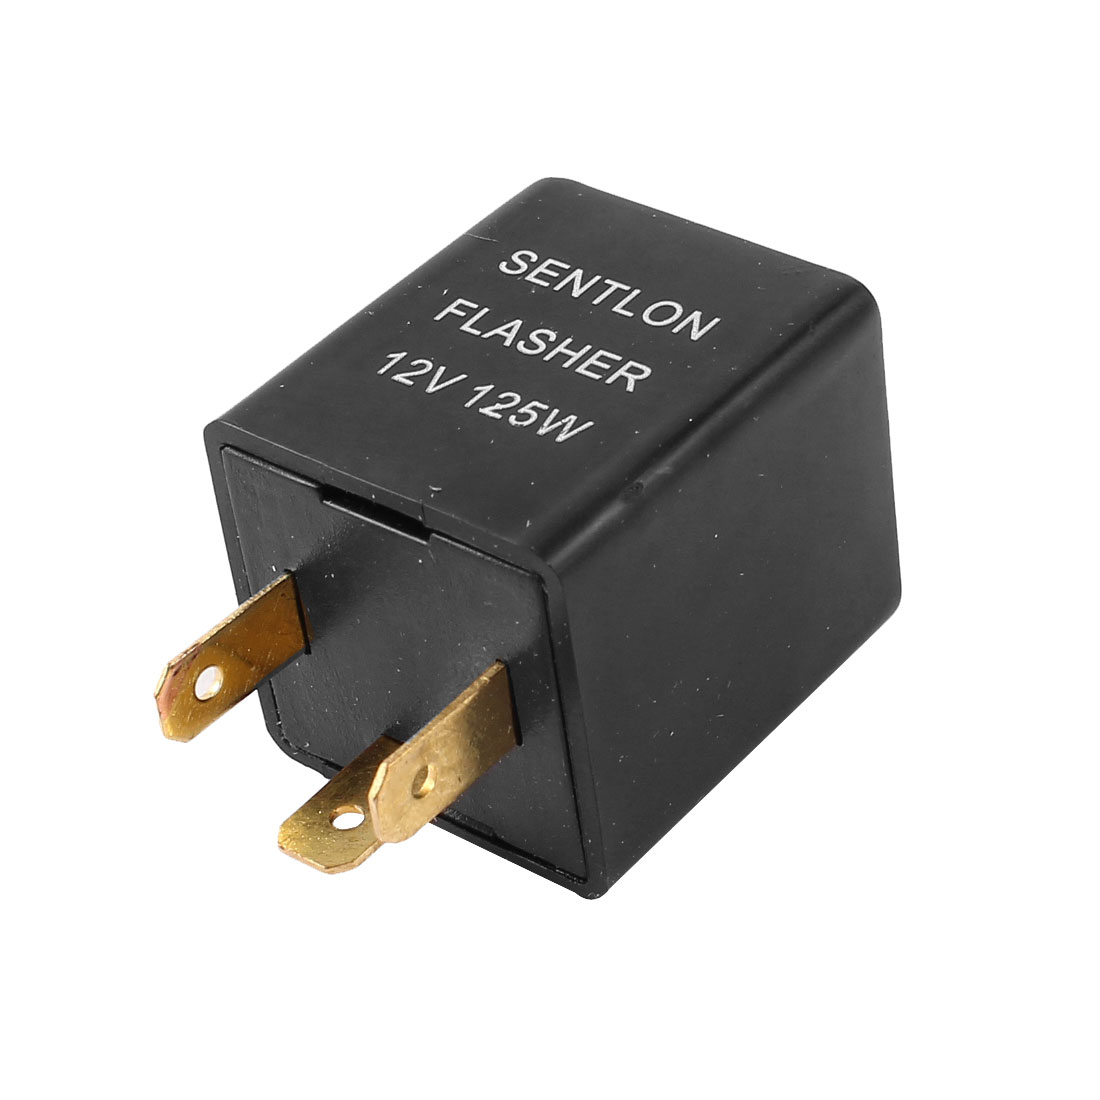 Black 3 Flat Pin Socket Electronic Parts Motorcycle Car LED Flasher DC 12V 125W